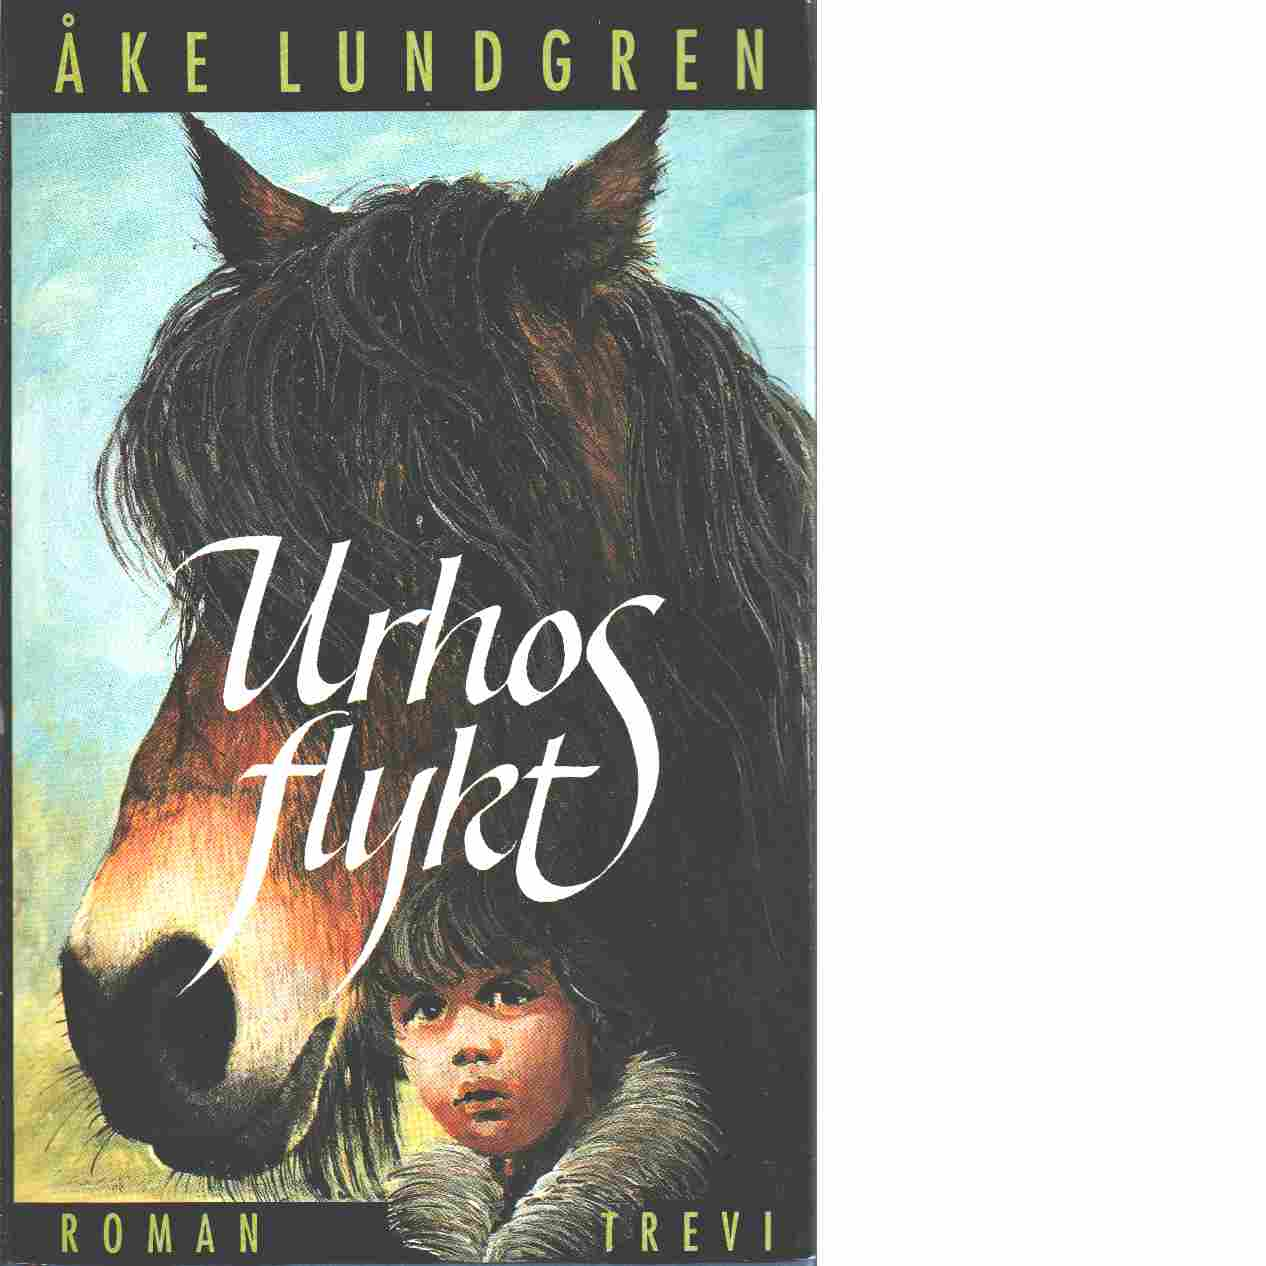 Urhos flykt : [roman] - Lundgren, Åke